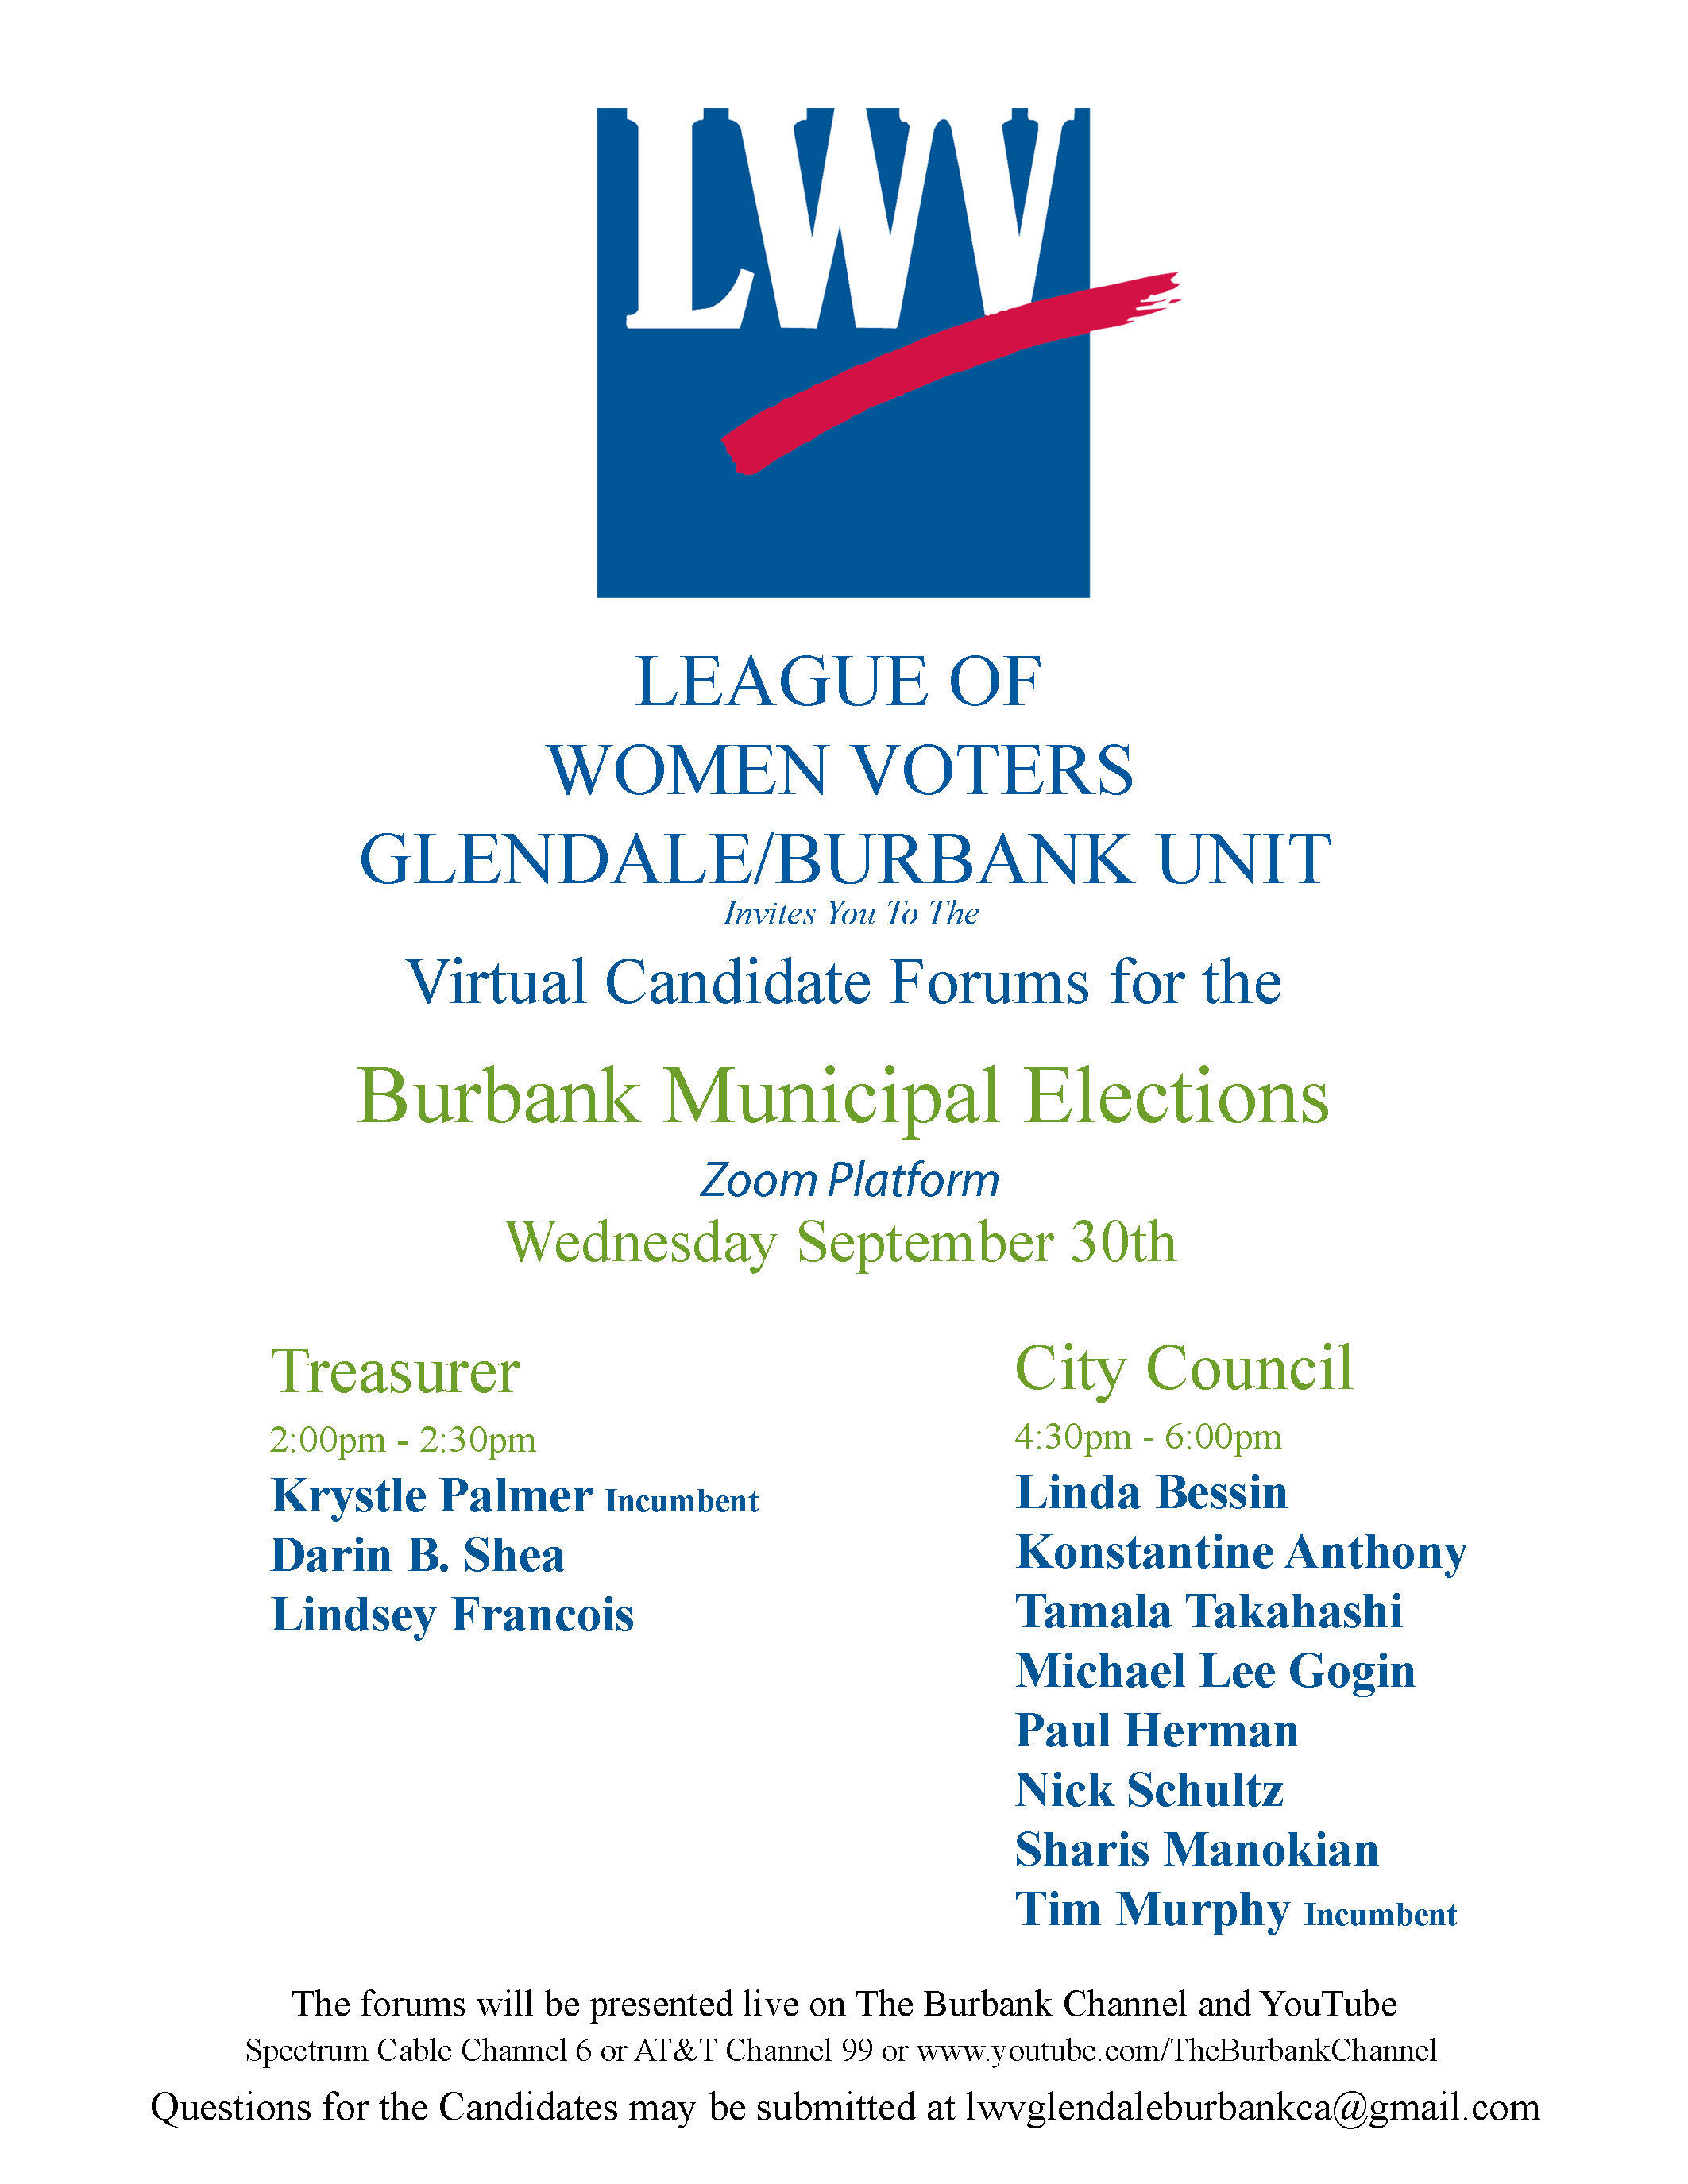 Glendale/Burbank Candidate Forums